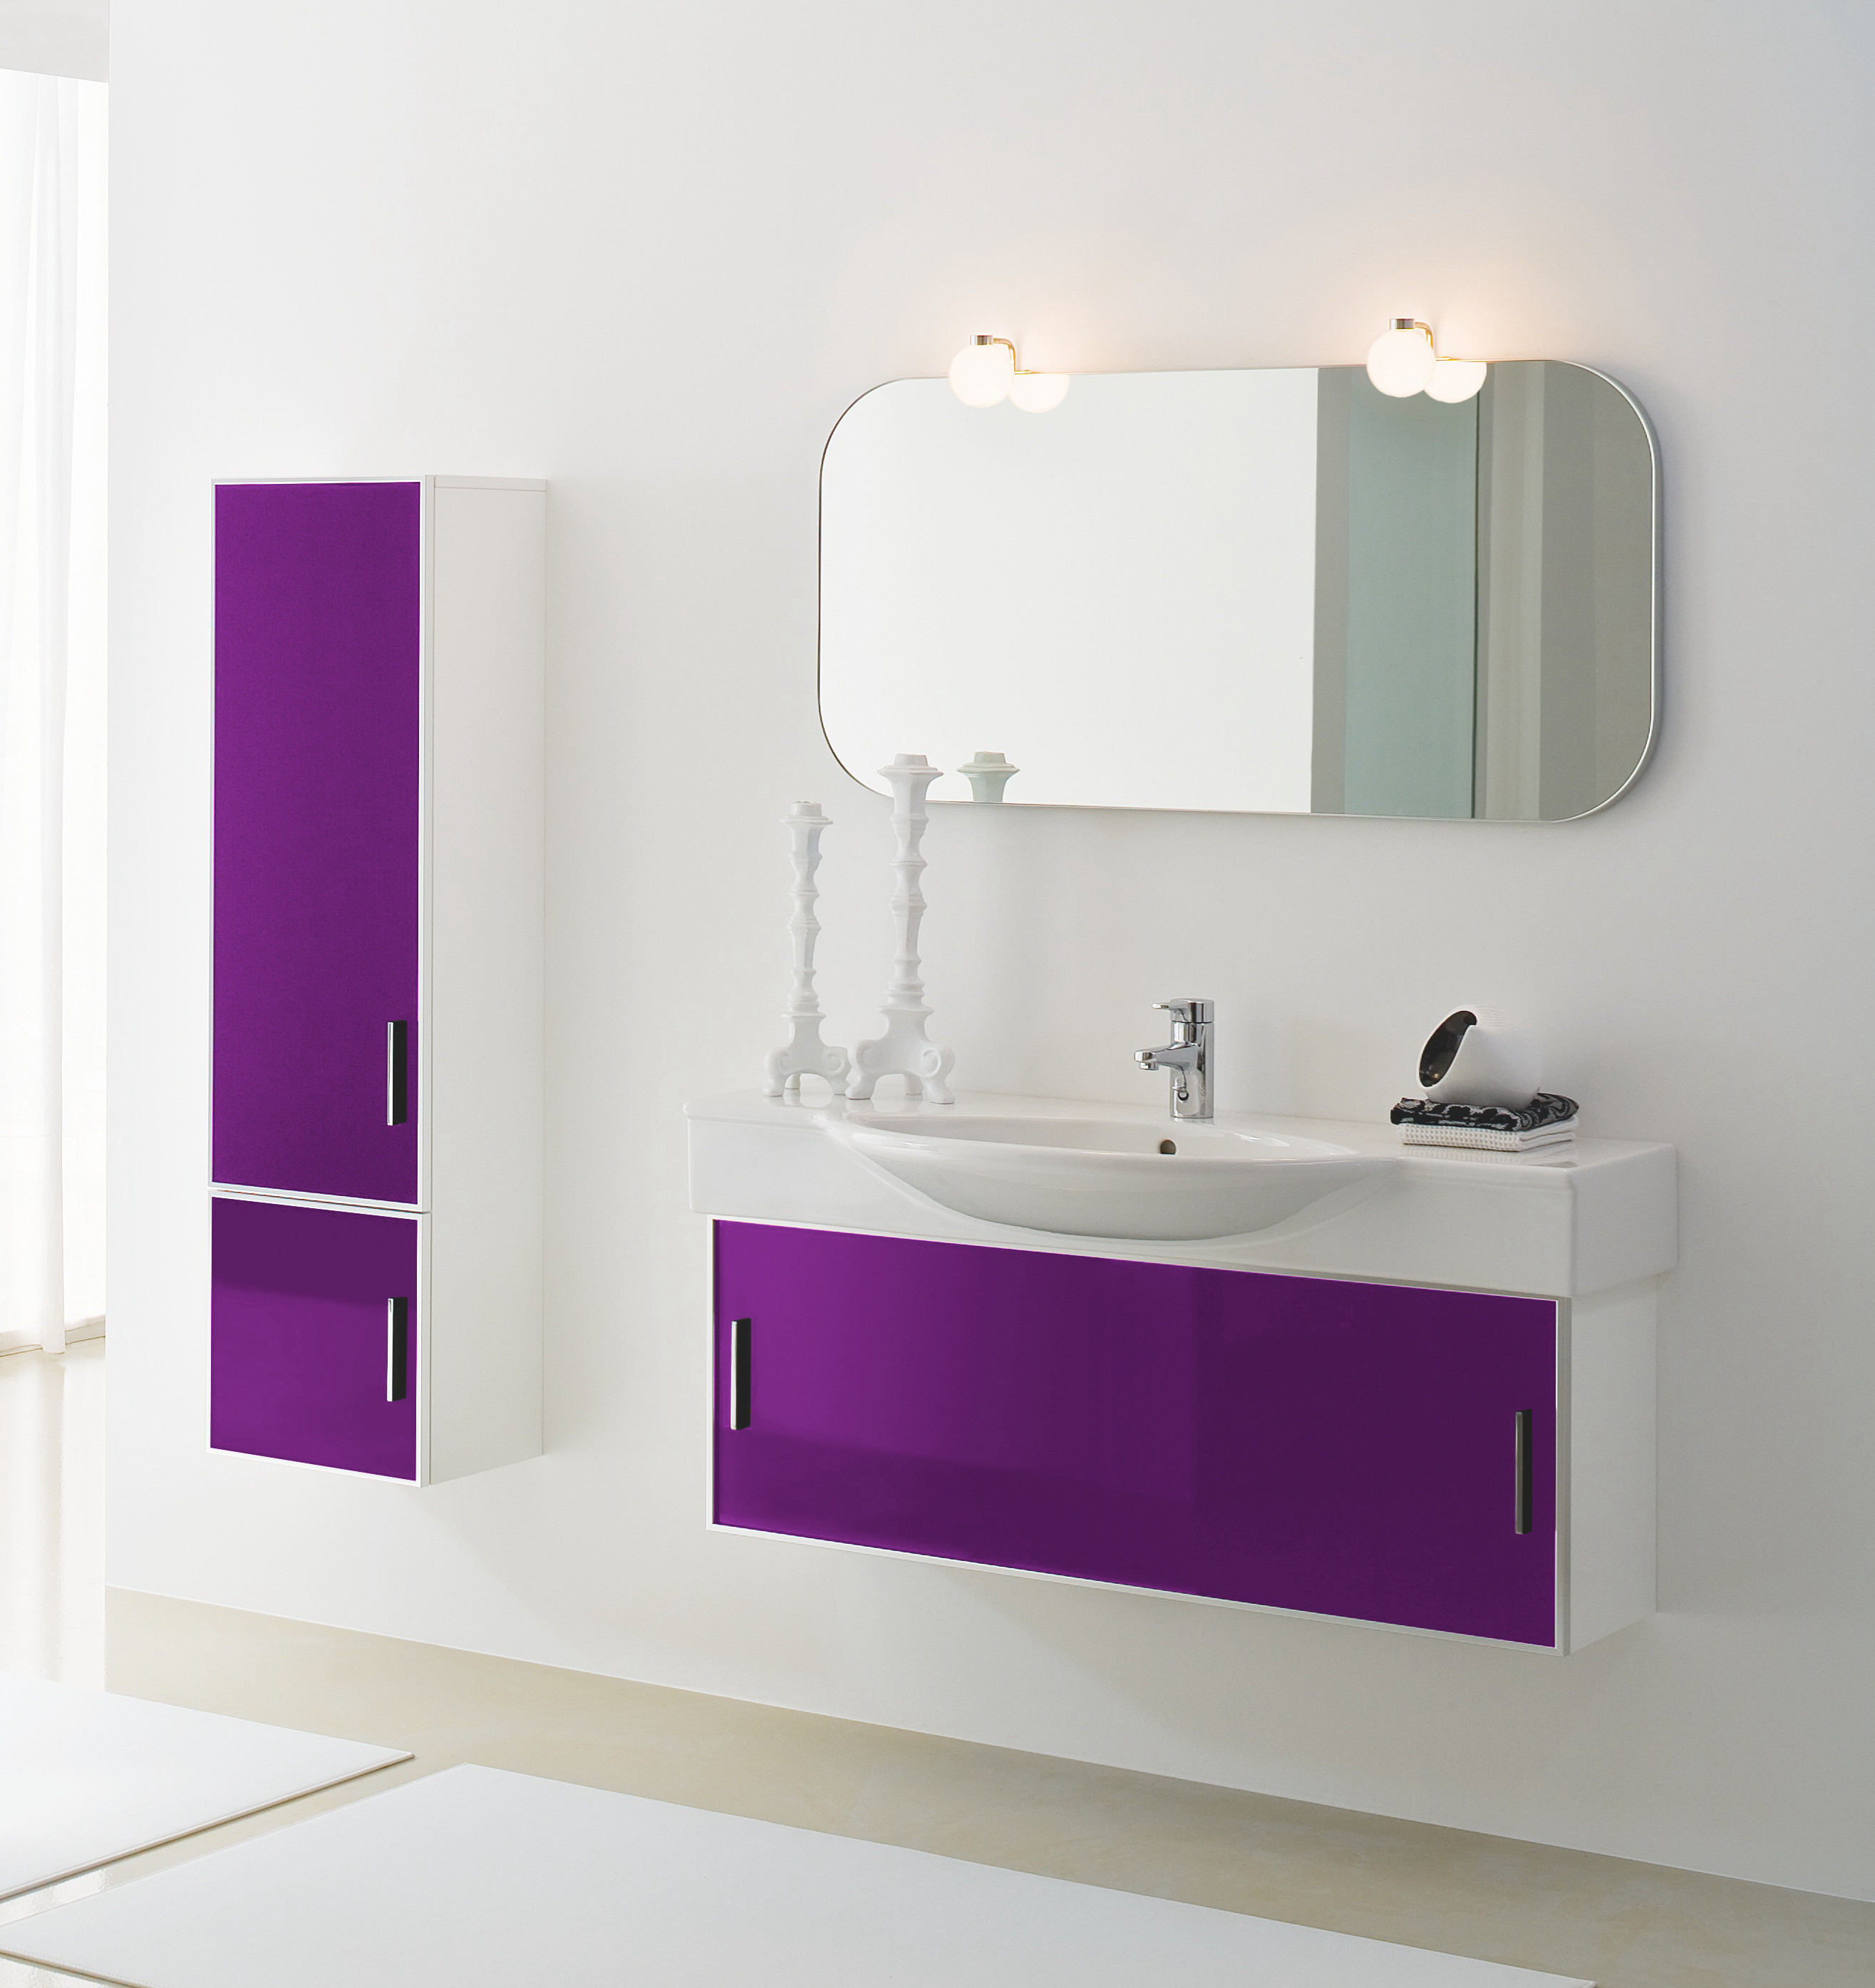 Meuble d\'angle salle de bain pas cher - veranda-styledevie.fr